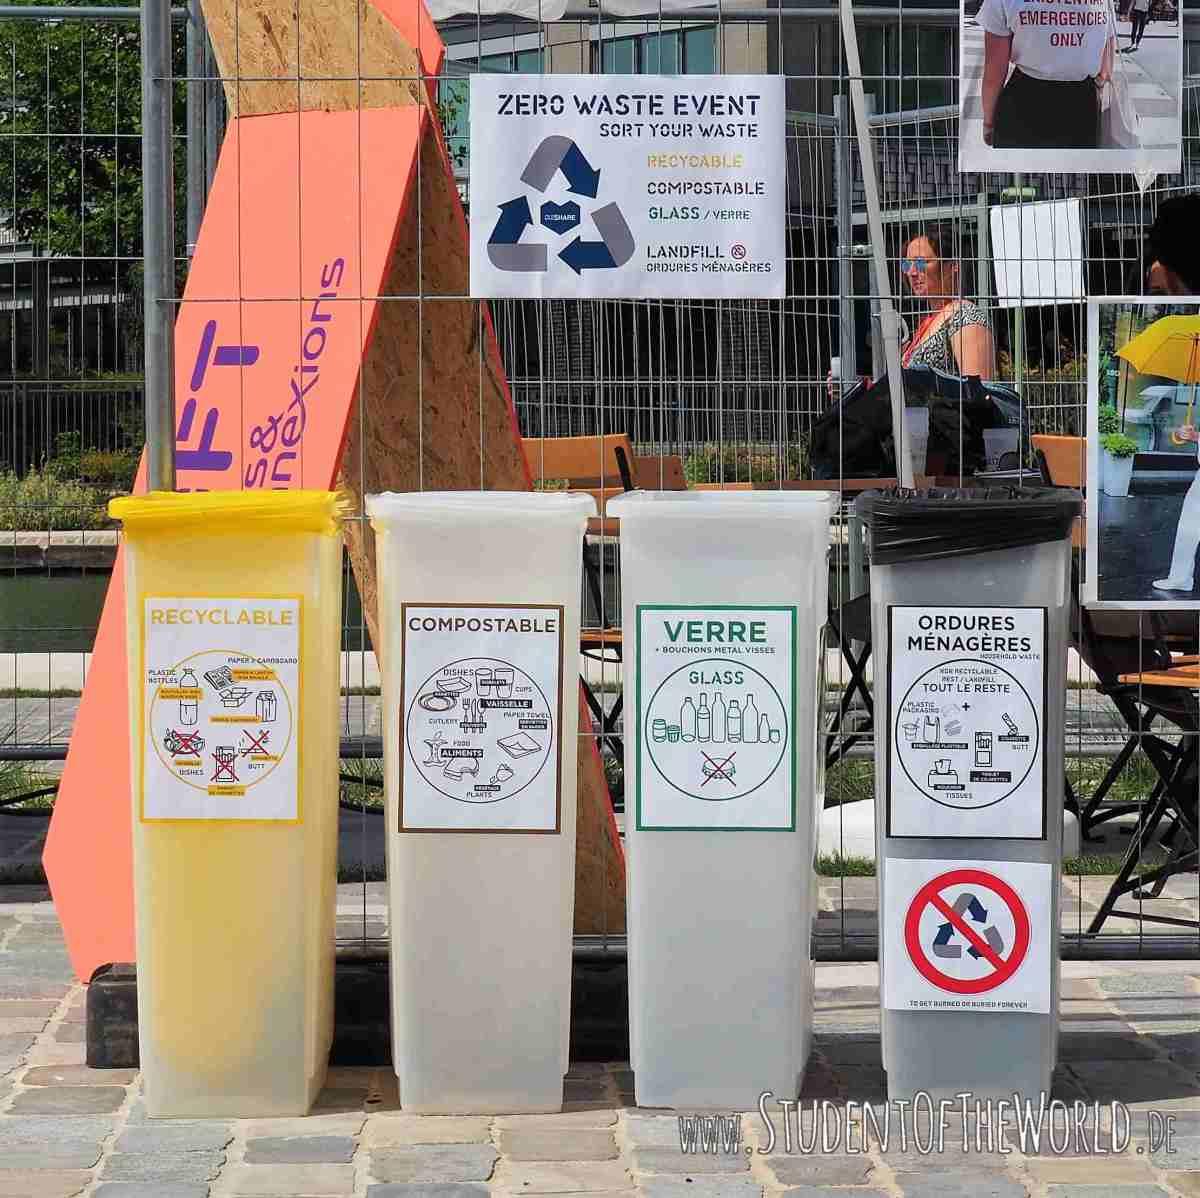 OuishareFest 2017 aimed at zero waste.